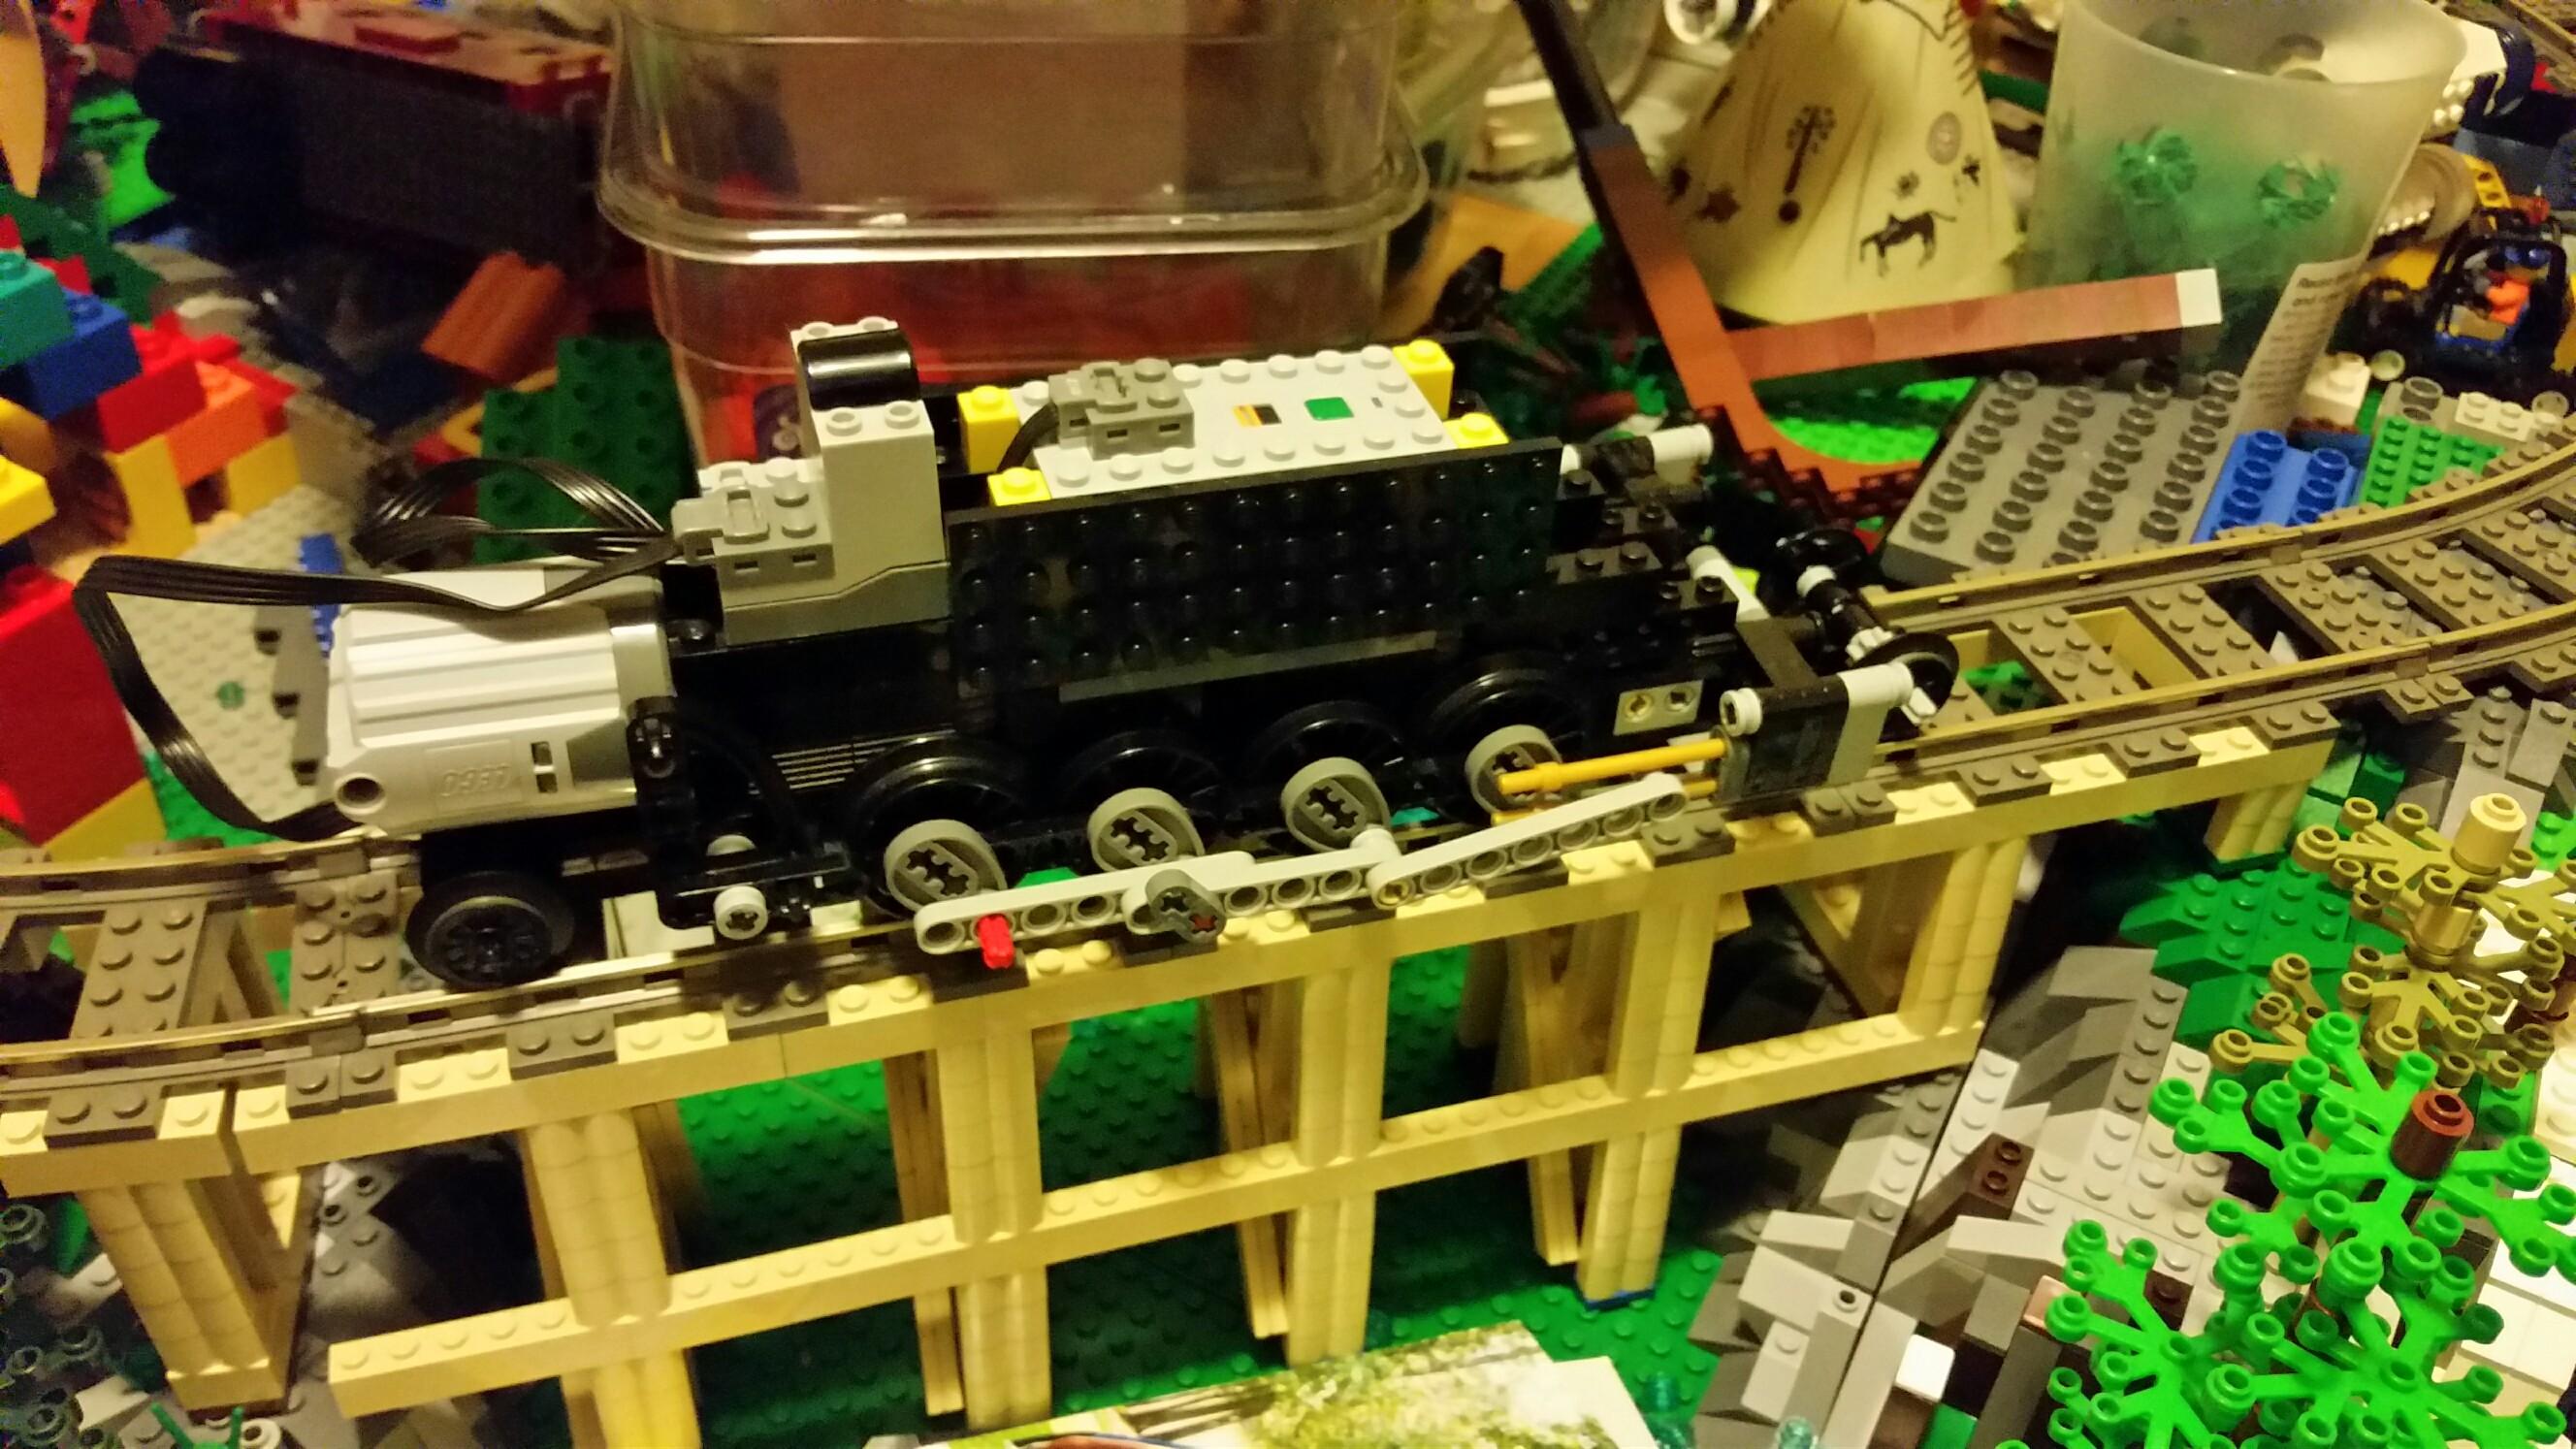 engine_1-2656x1494.jpg